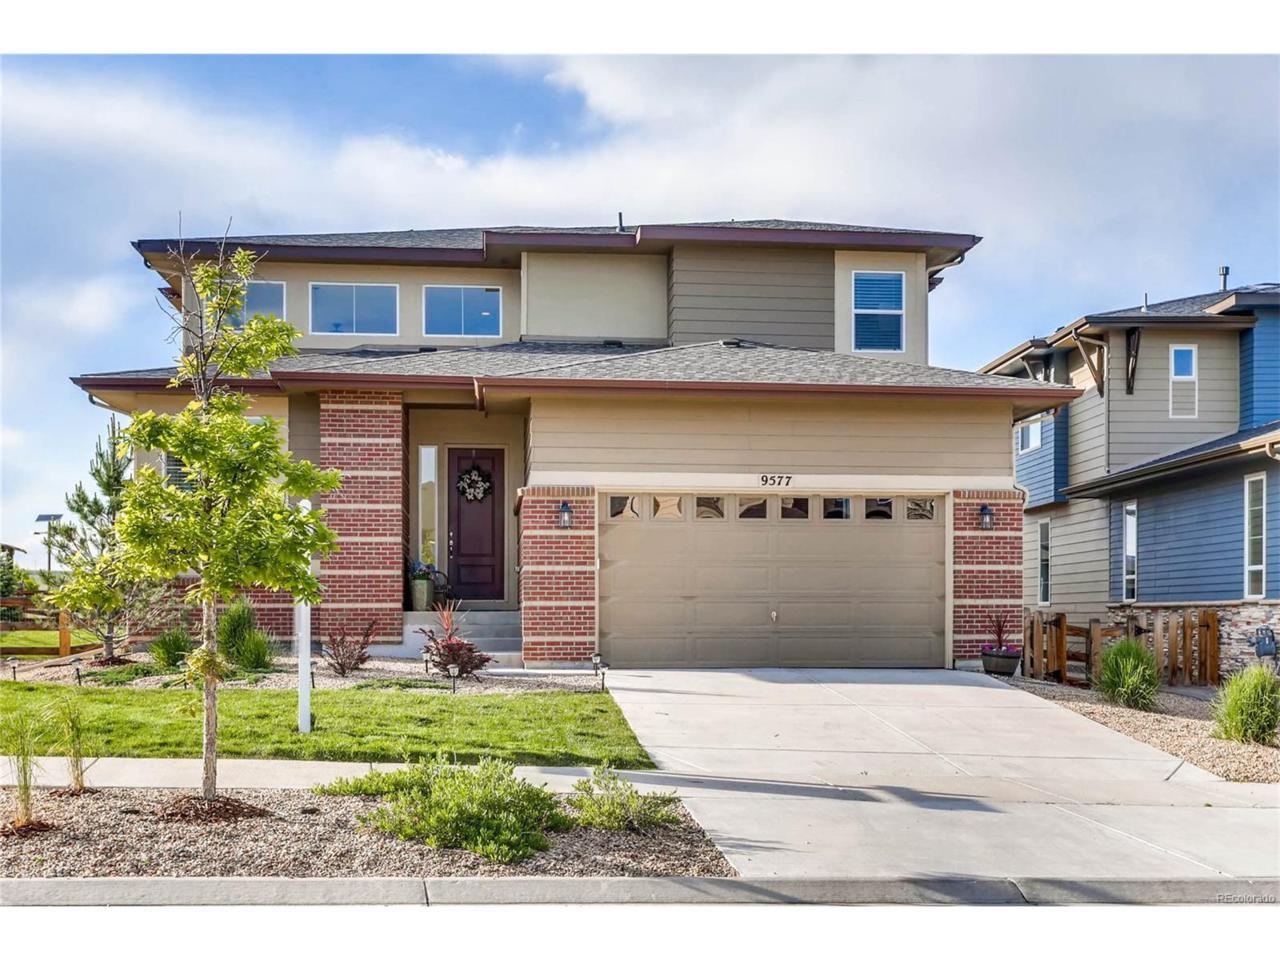 9577 Juniper Way, Arvada, CO 80007 (MLS #9398120) :: 8z Real Estate